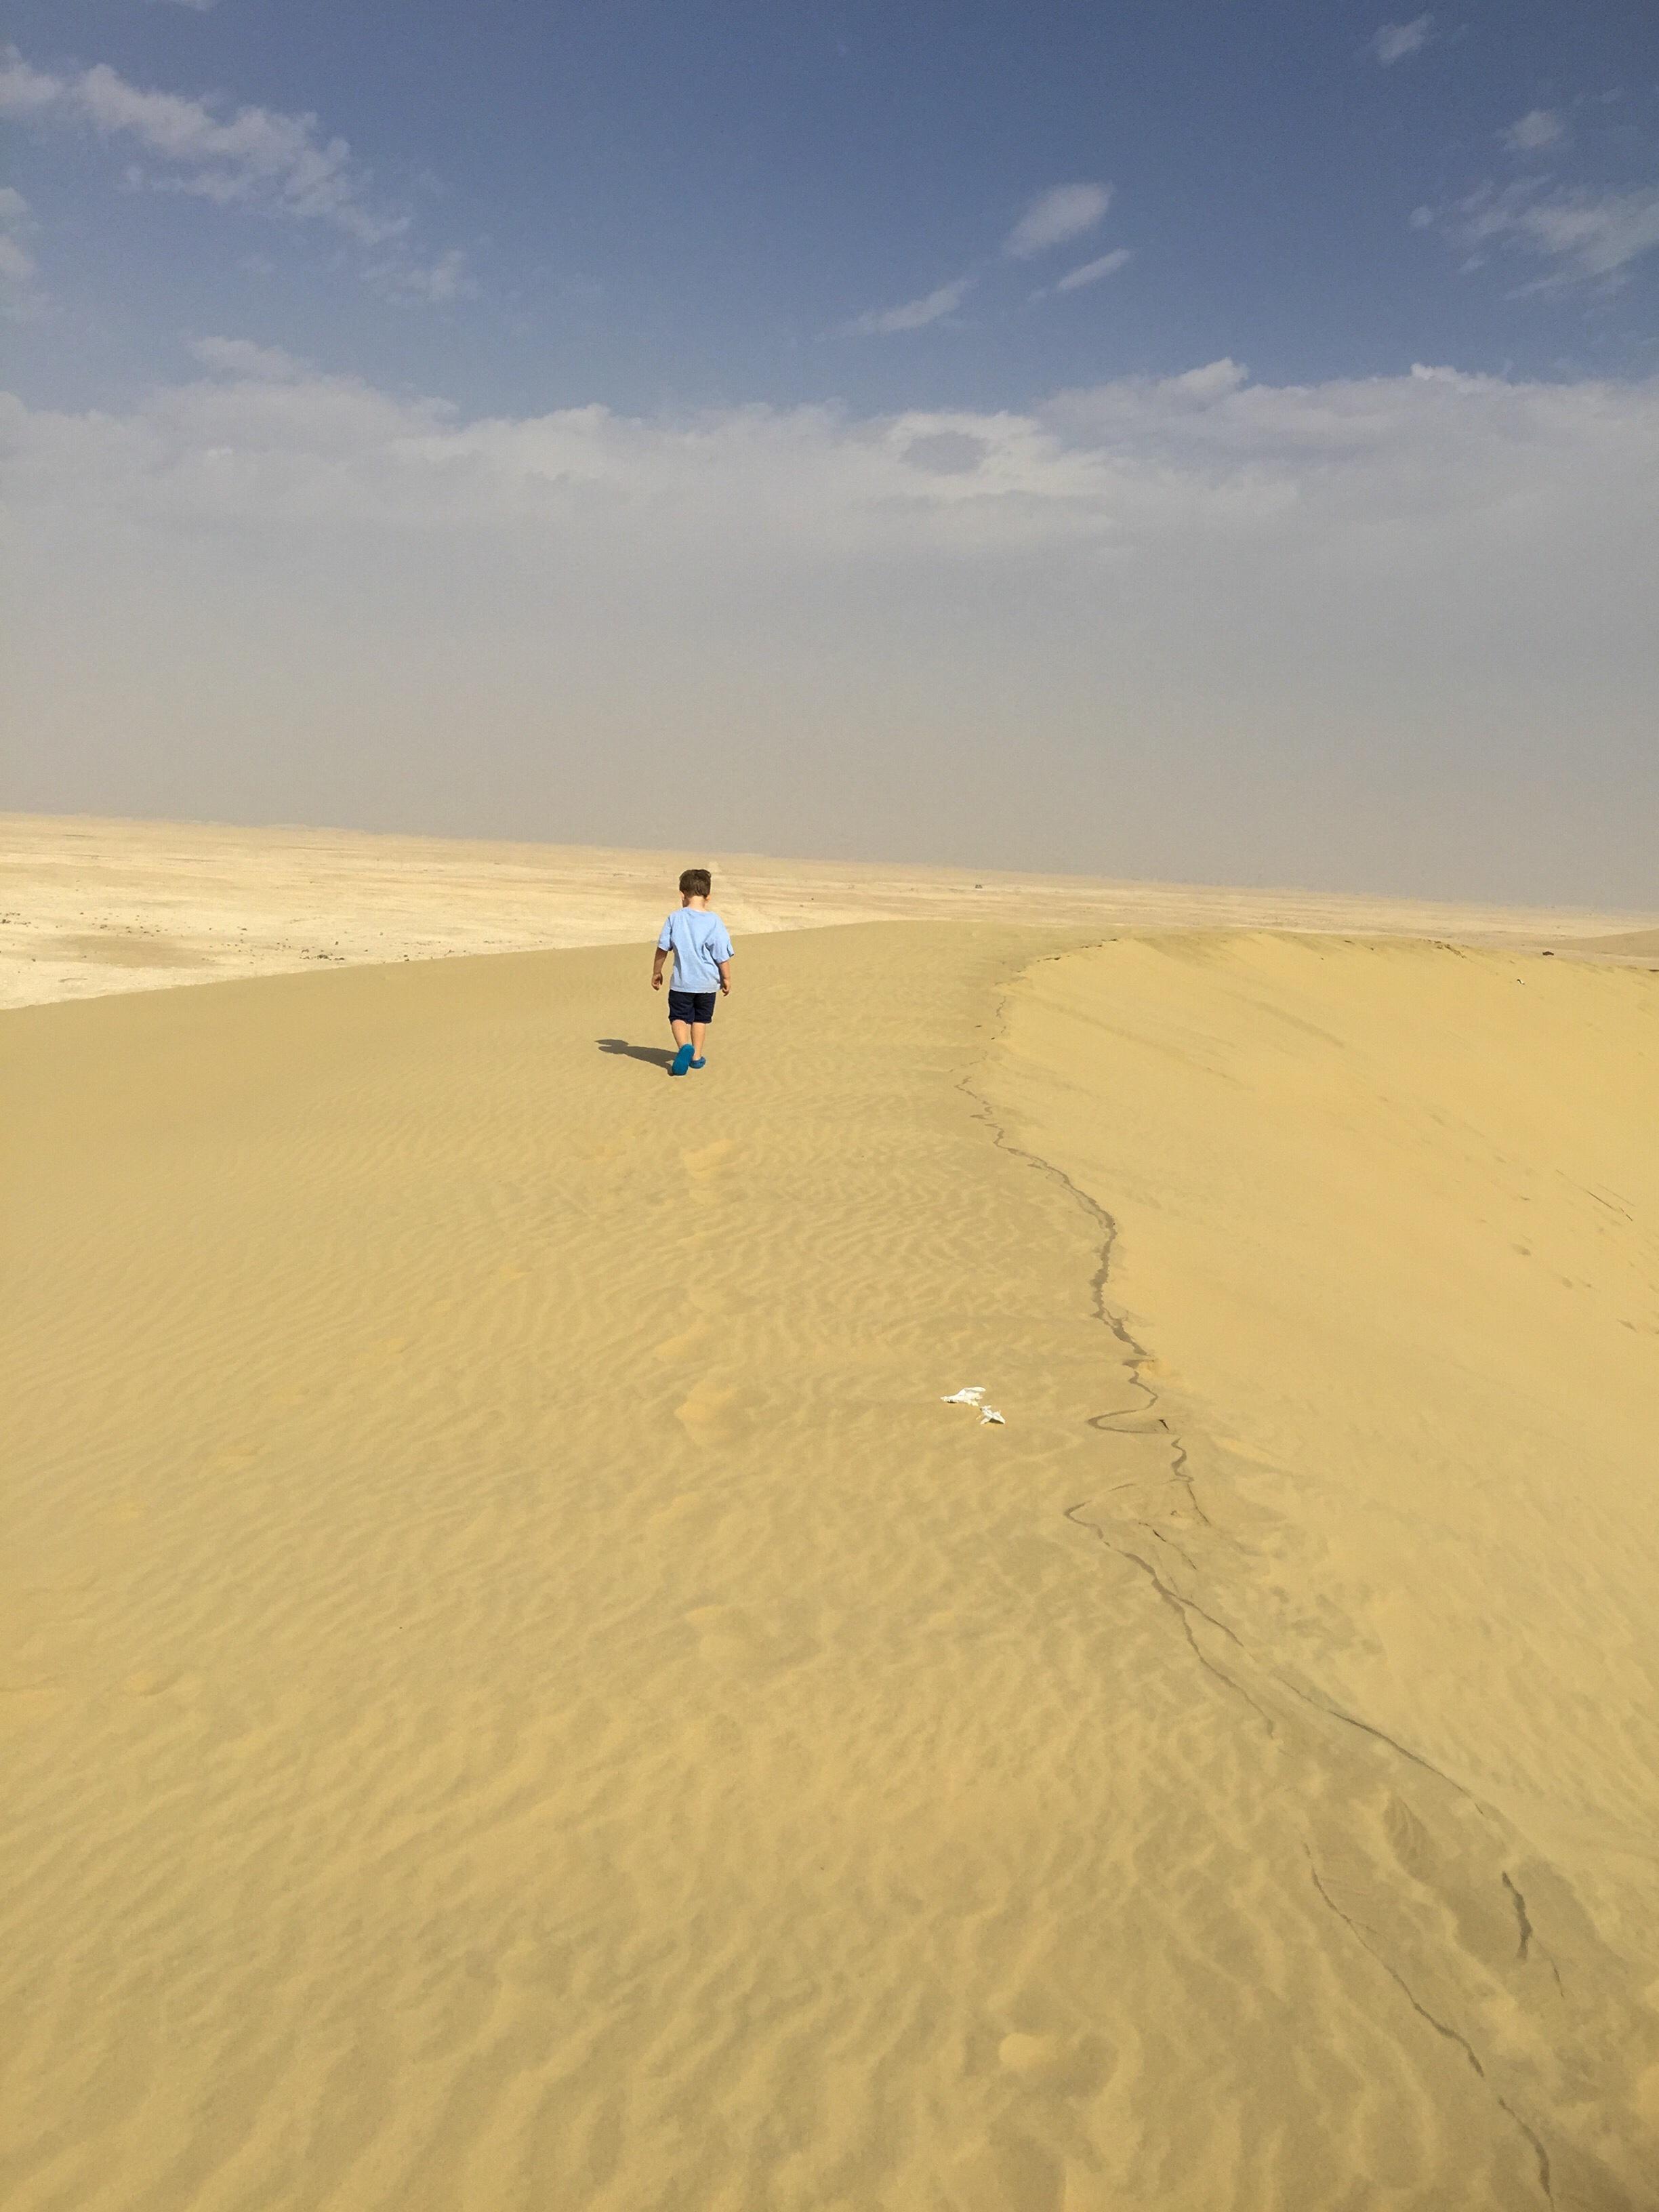 A post-Christmas desert visit